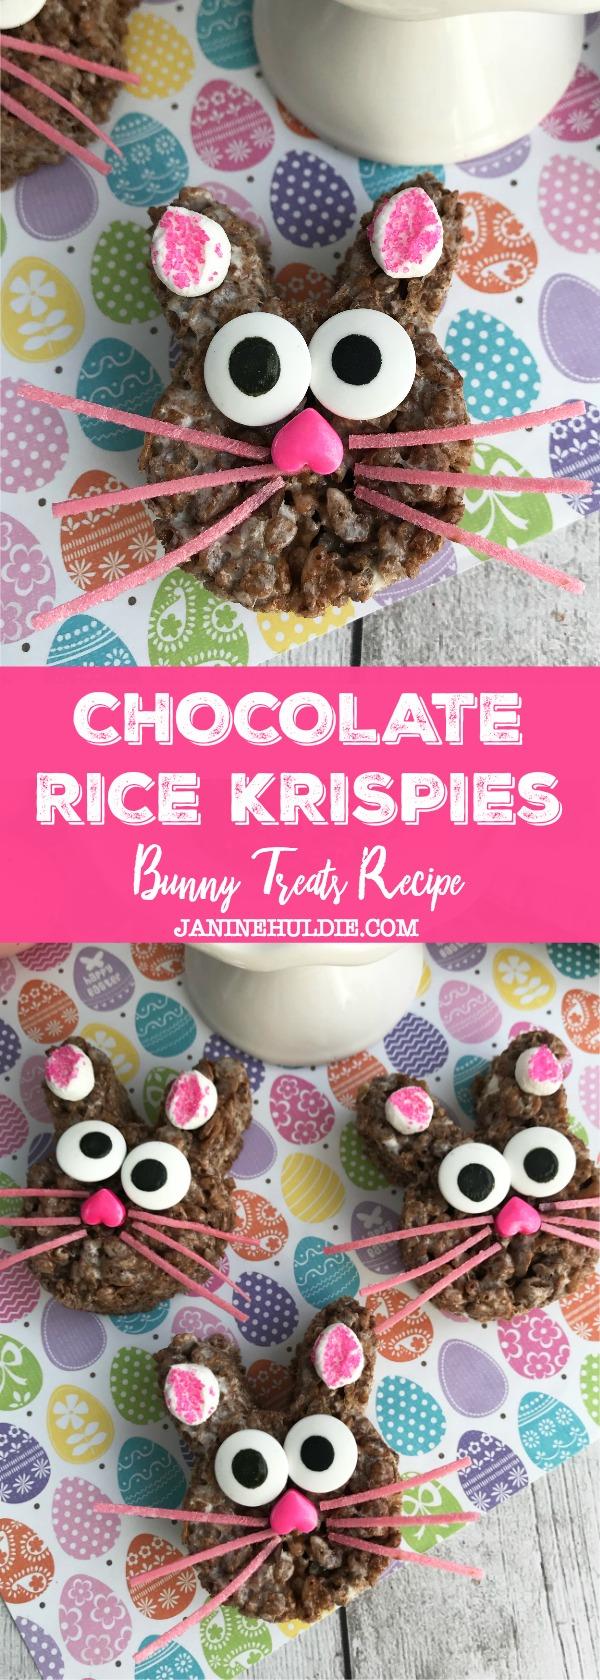 Chocolate Rice Krispies Bunny Treats Recipe